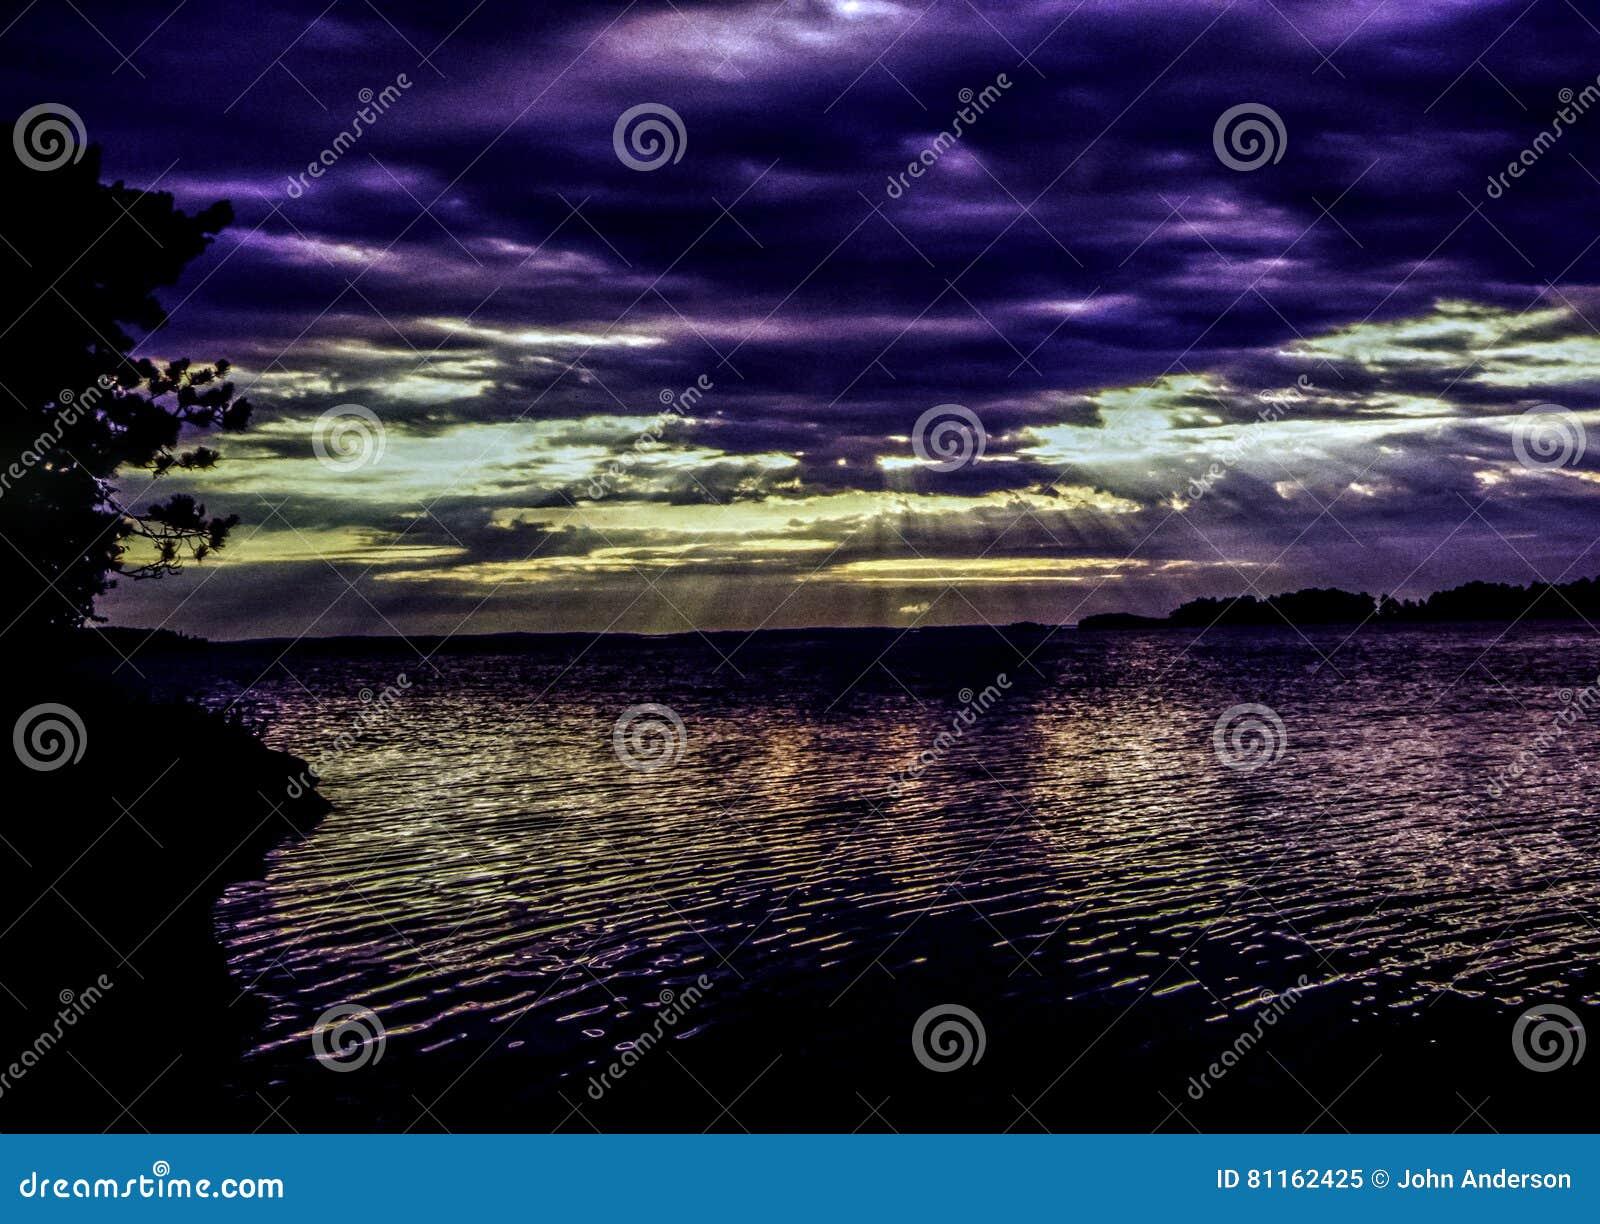 Rainy lake at sunset